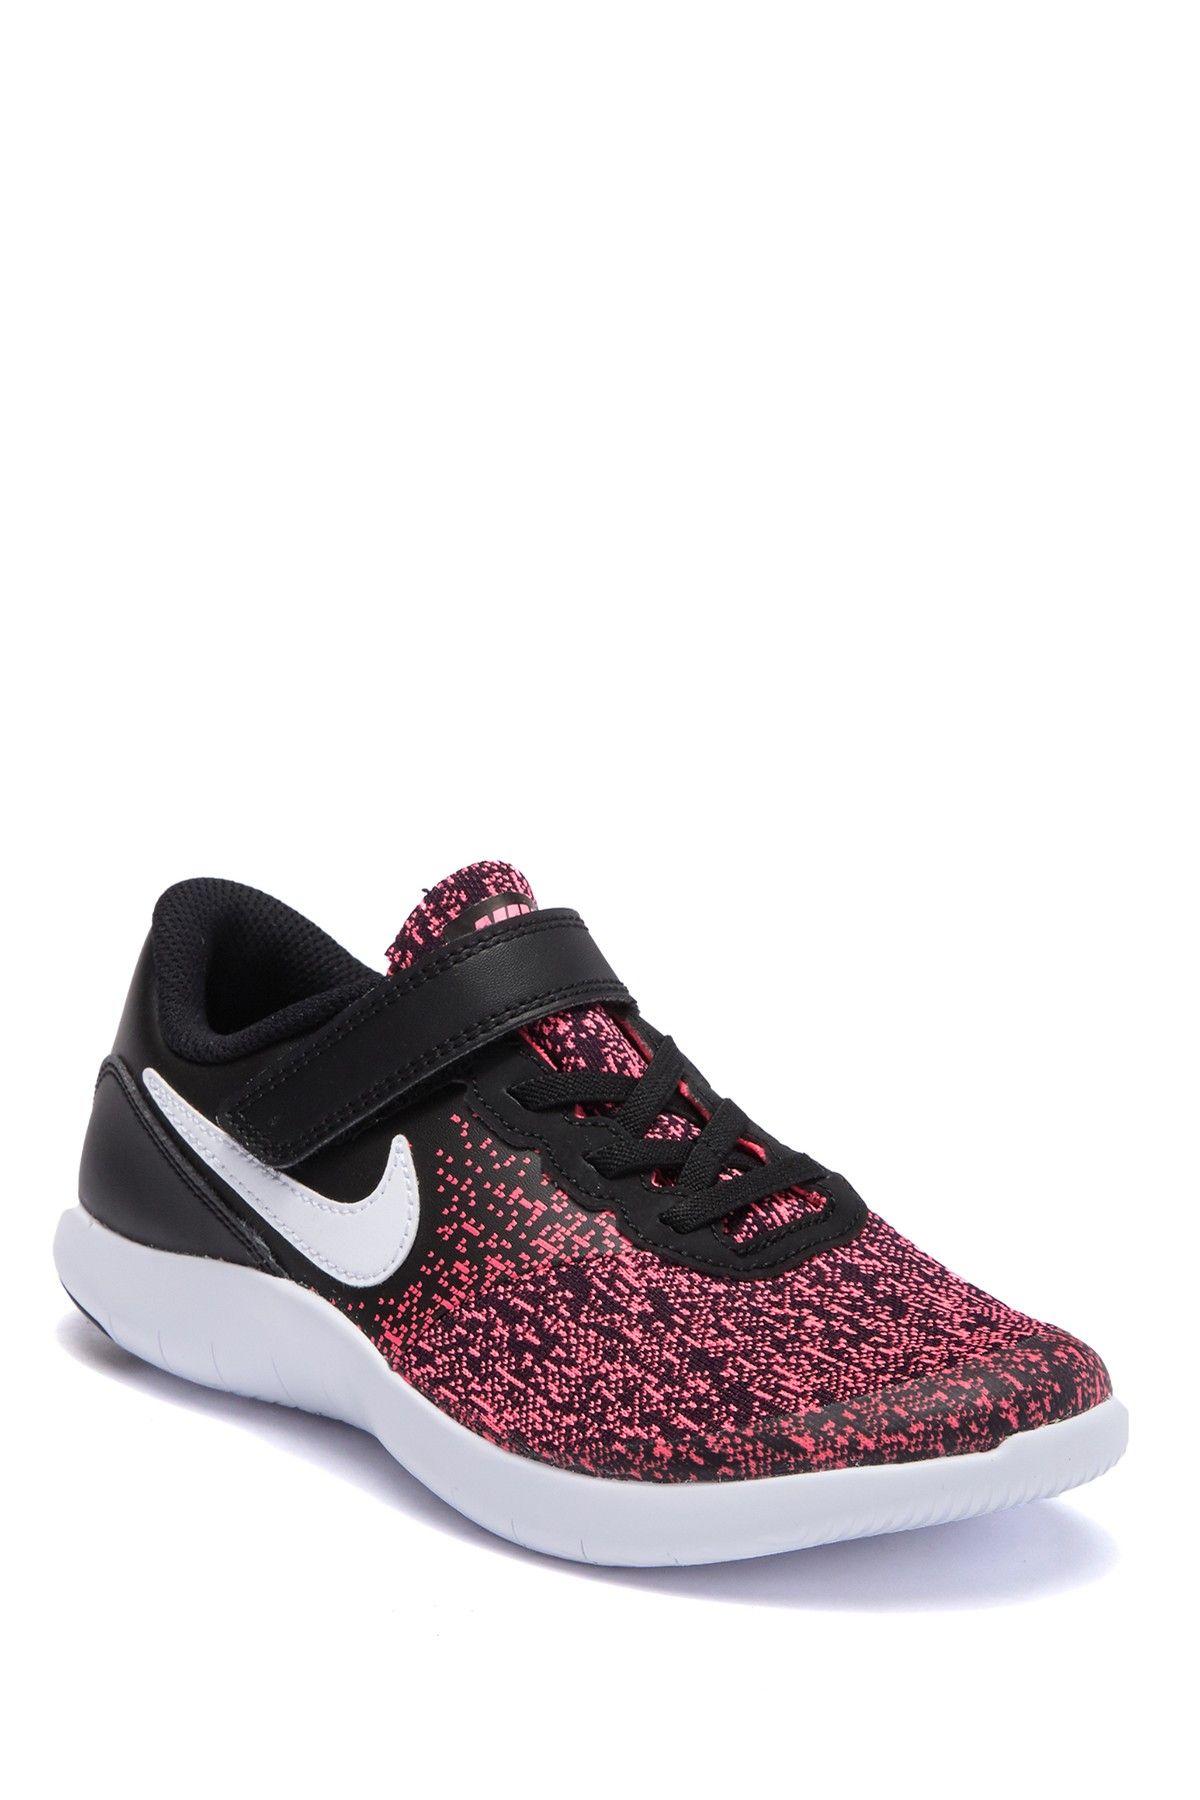 ffa28cc5bd0 Image of Nike Flex Contact Sneaker (Little Kid)